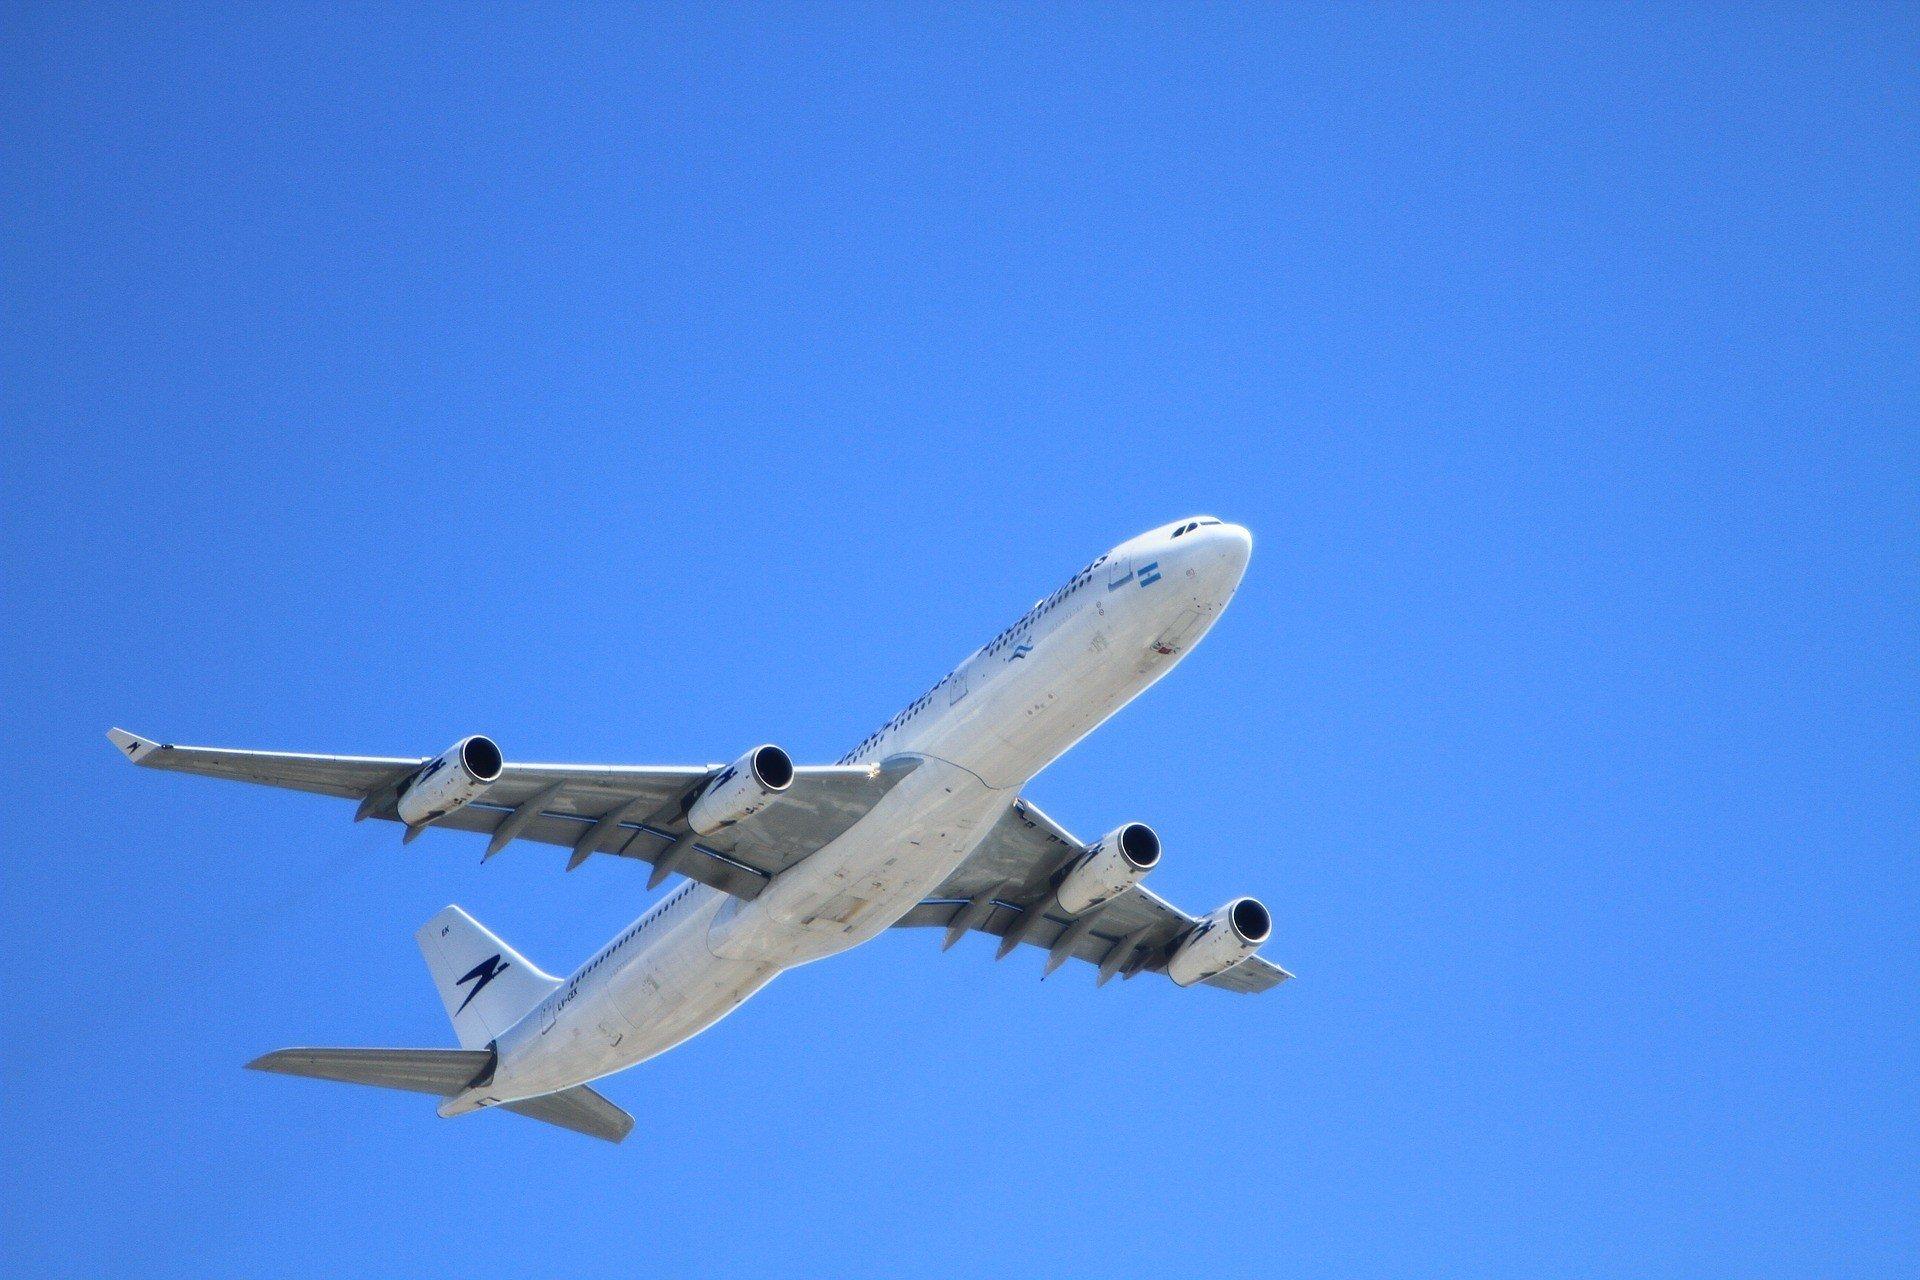 Последствия коронавирусного кризиса для авиаперевозок